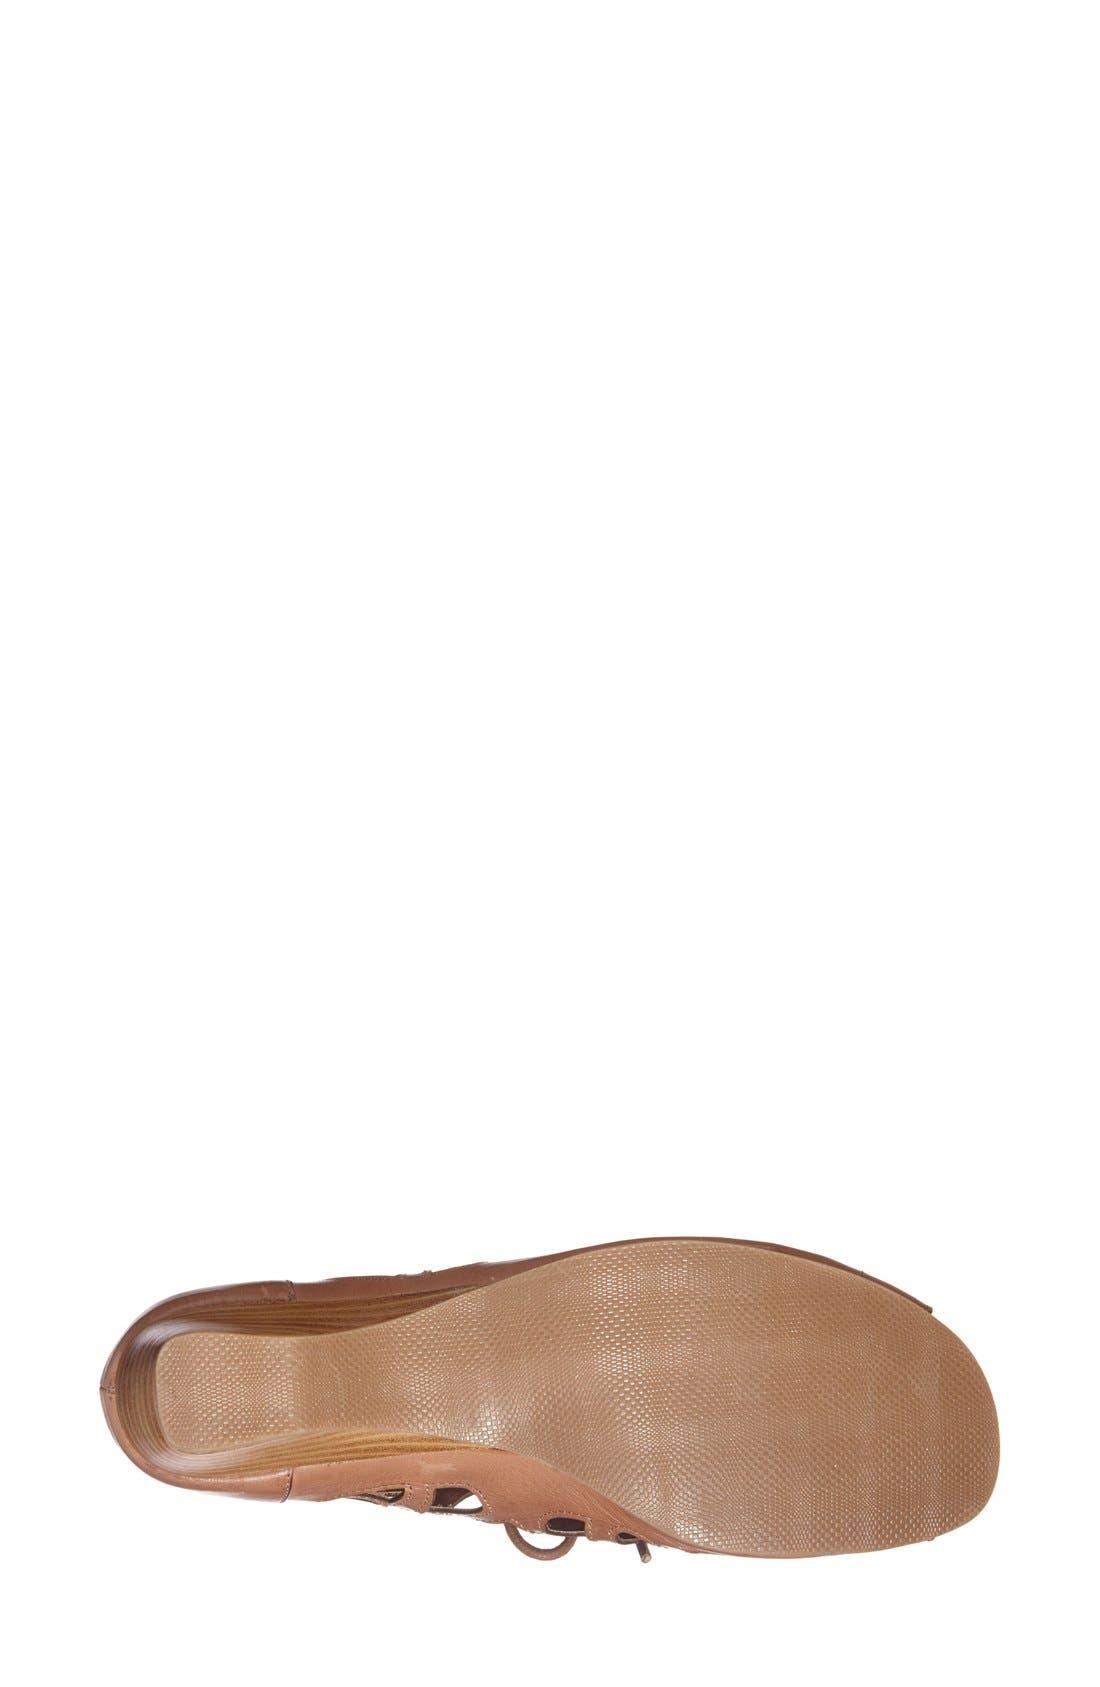 Alternate Image 4  - Bella Vita 'Pixie' Lace Up Cutout Leather Sandal